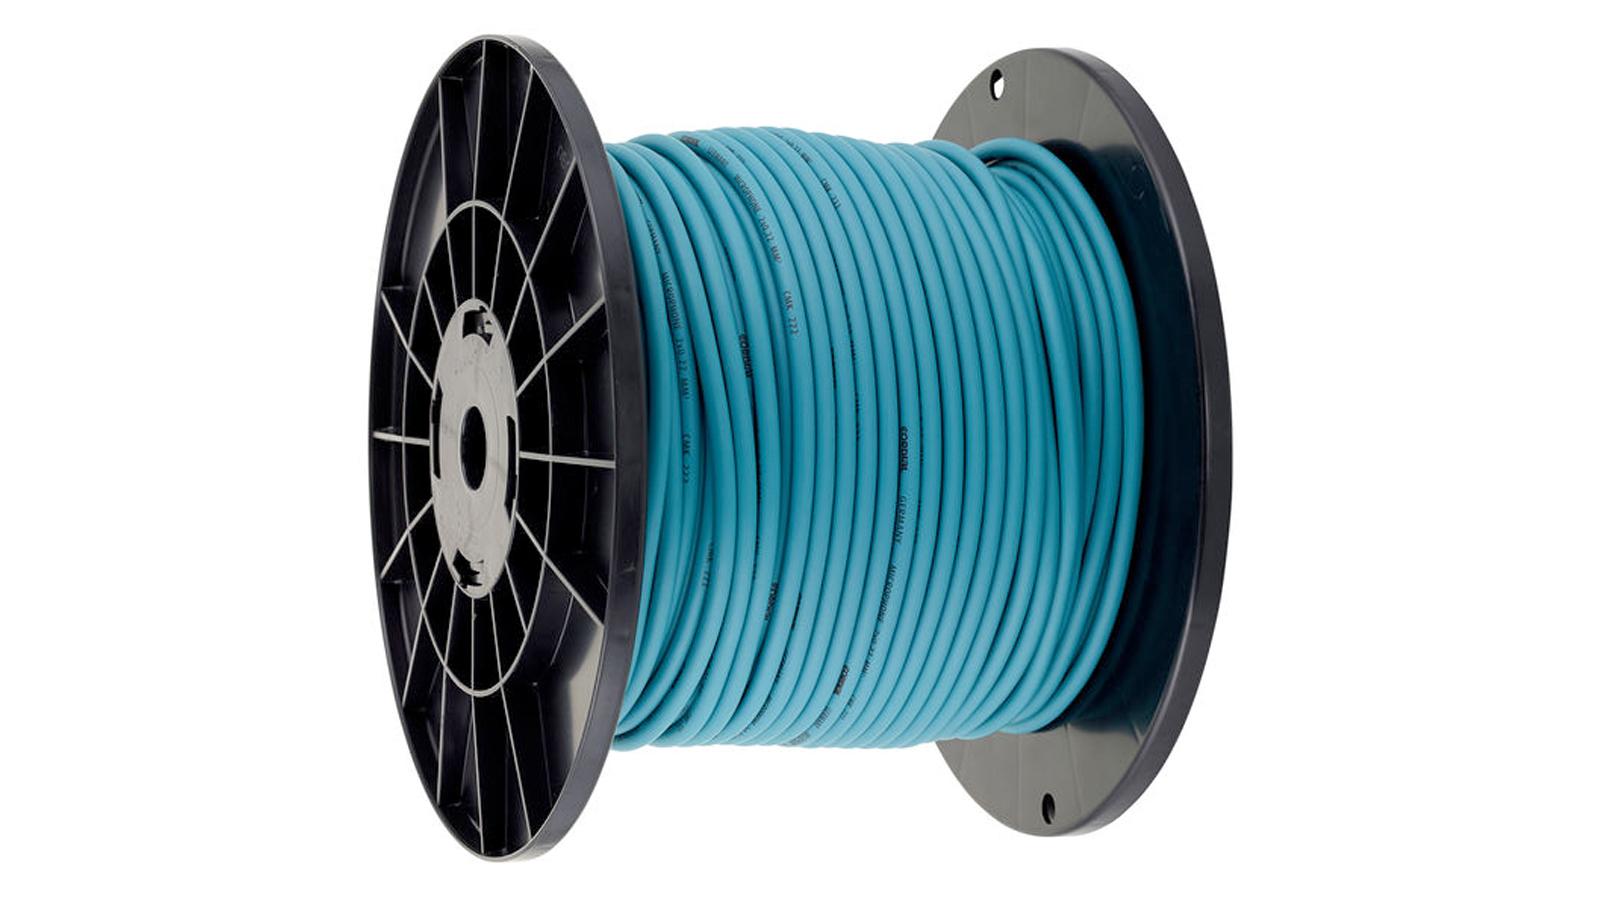 Cordial CMK-222 Mikrofonkabel Blau Rolle